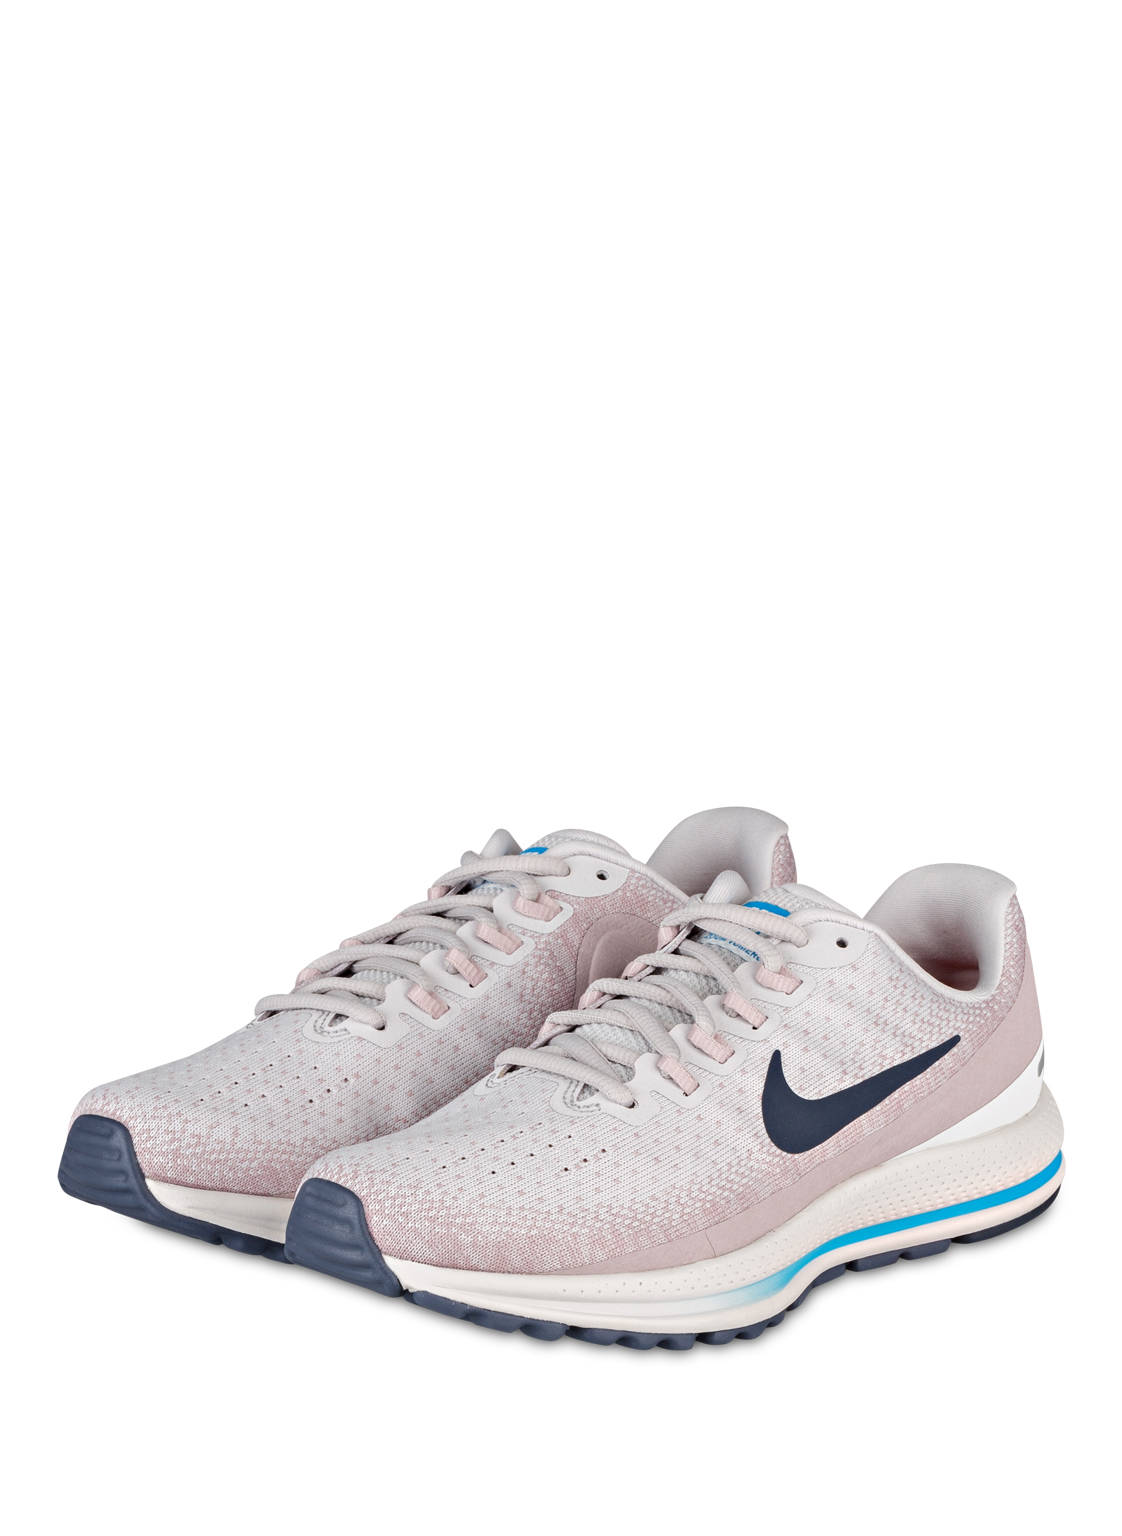 Nike Laufschuhe AIR ZOOM VOMERO 13